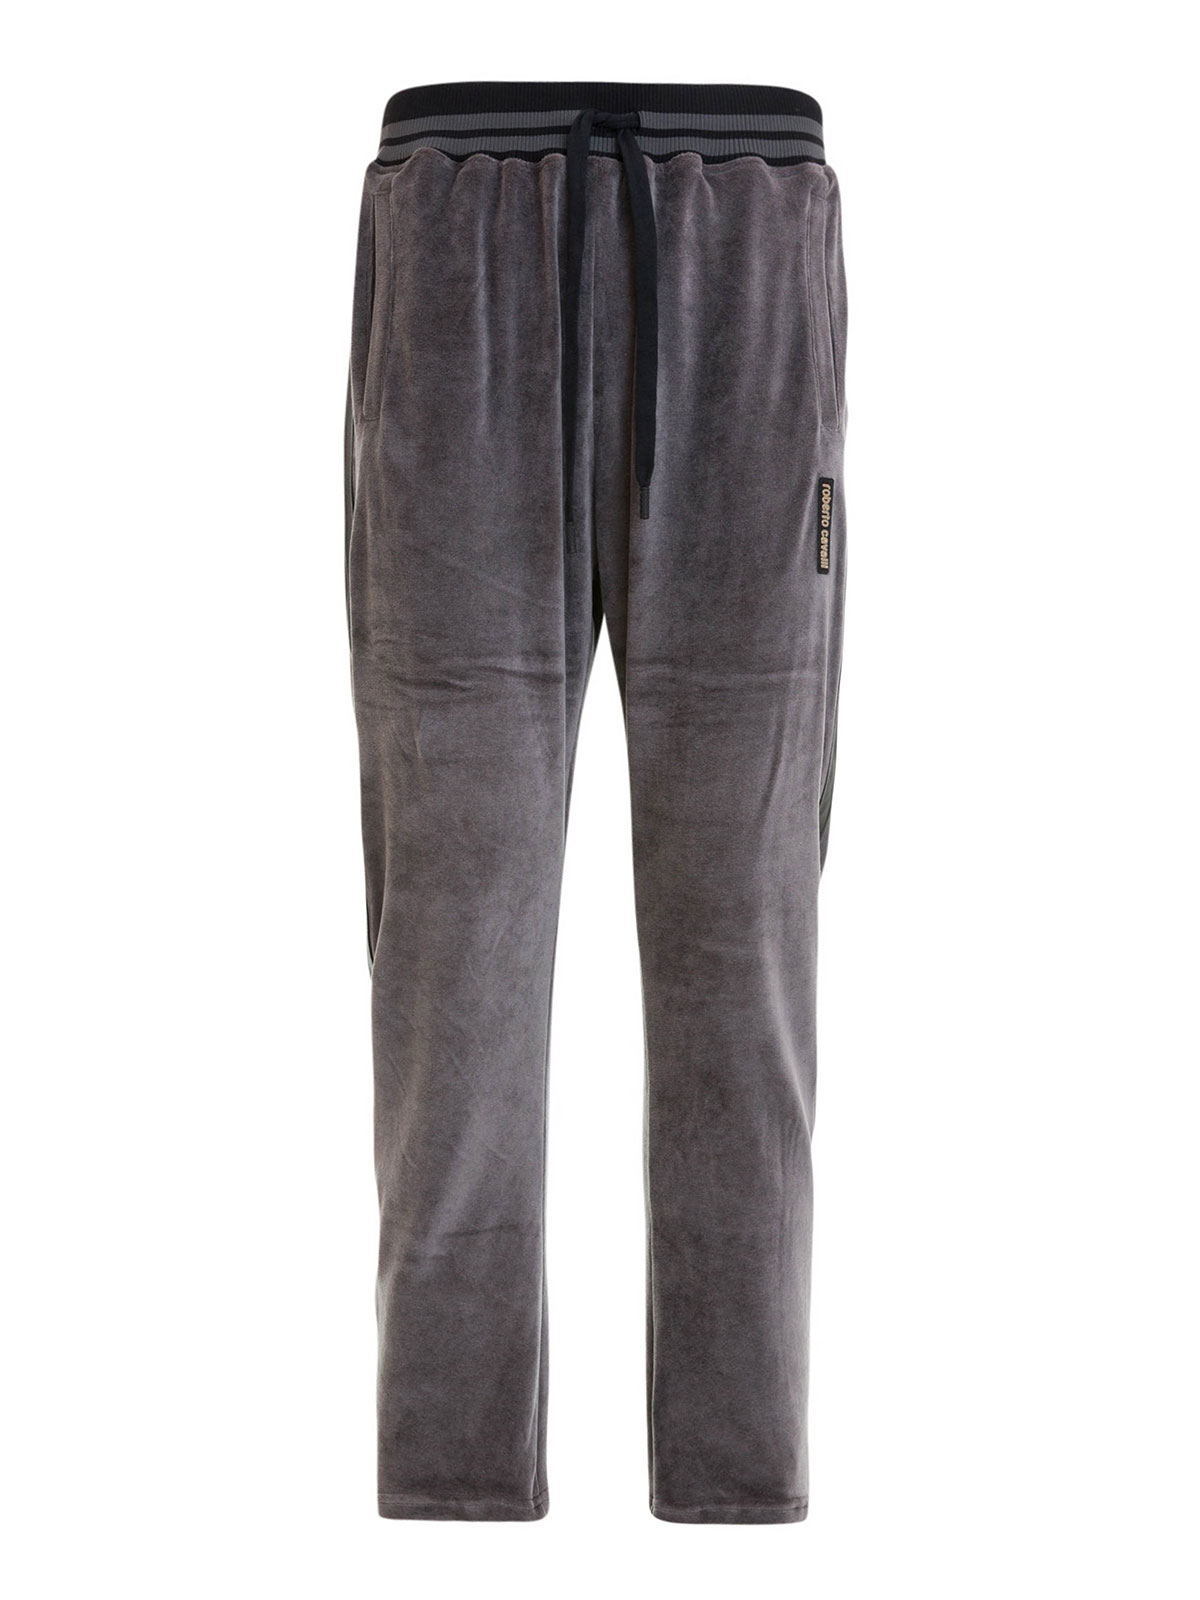 7cf758c11ea9 Roberto Cavalli - Chenille jogging trousers - tracksuit bottoms ...